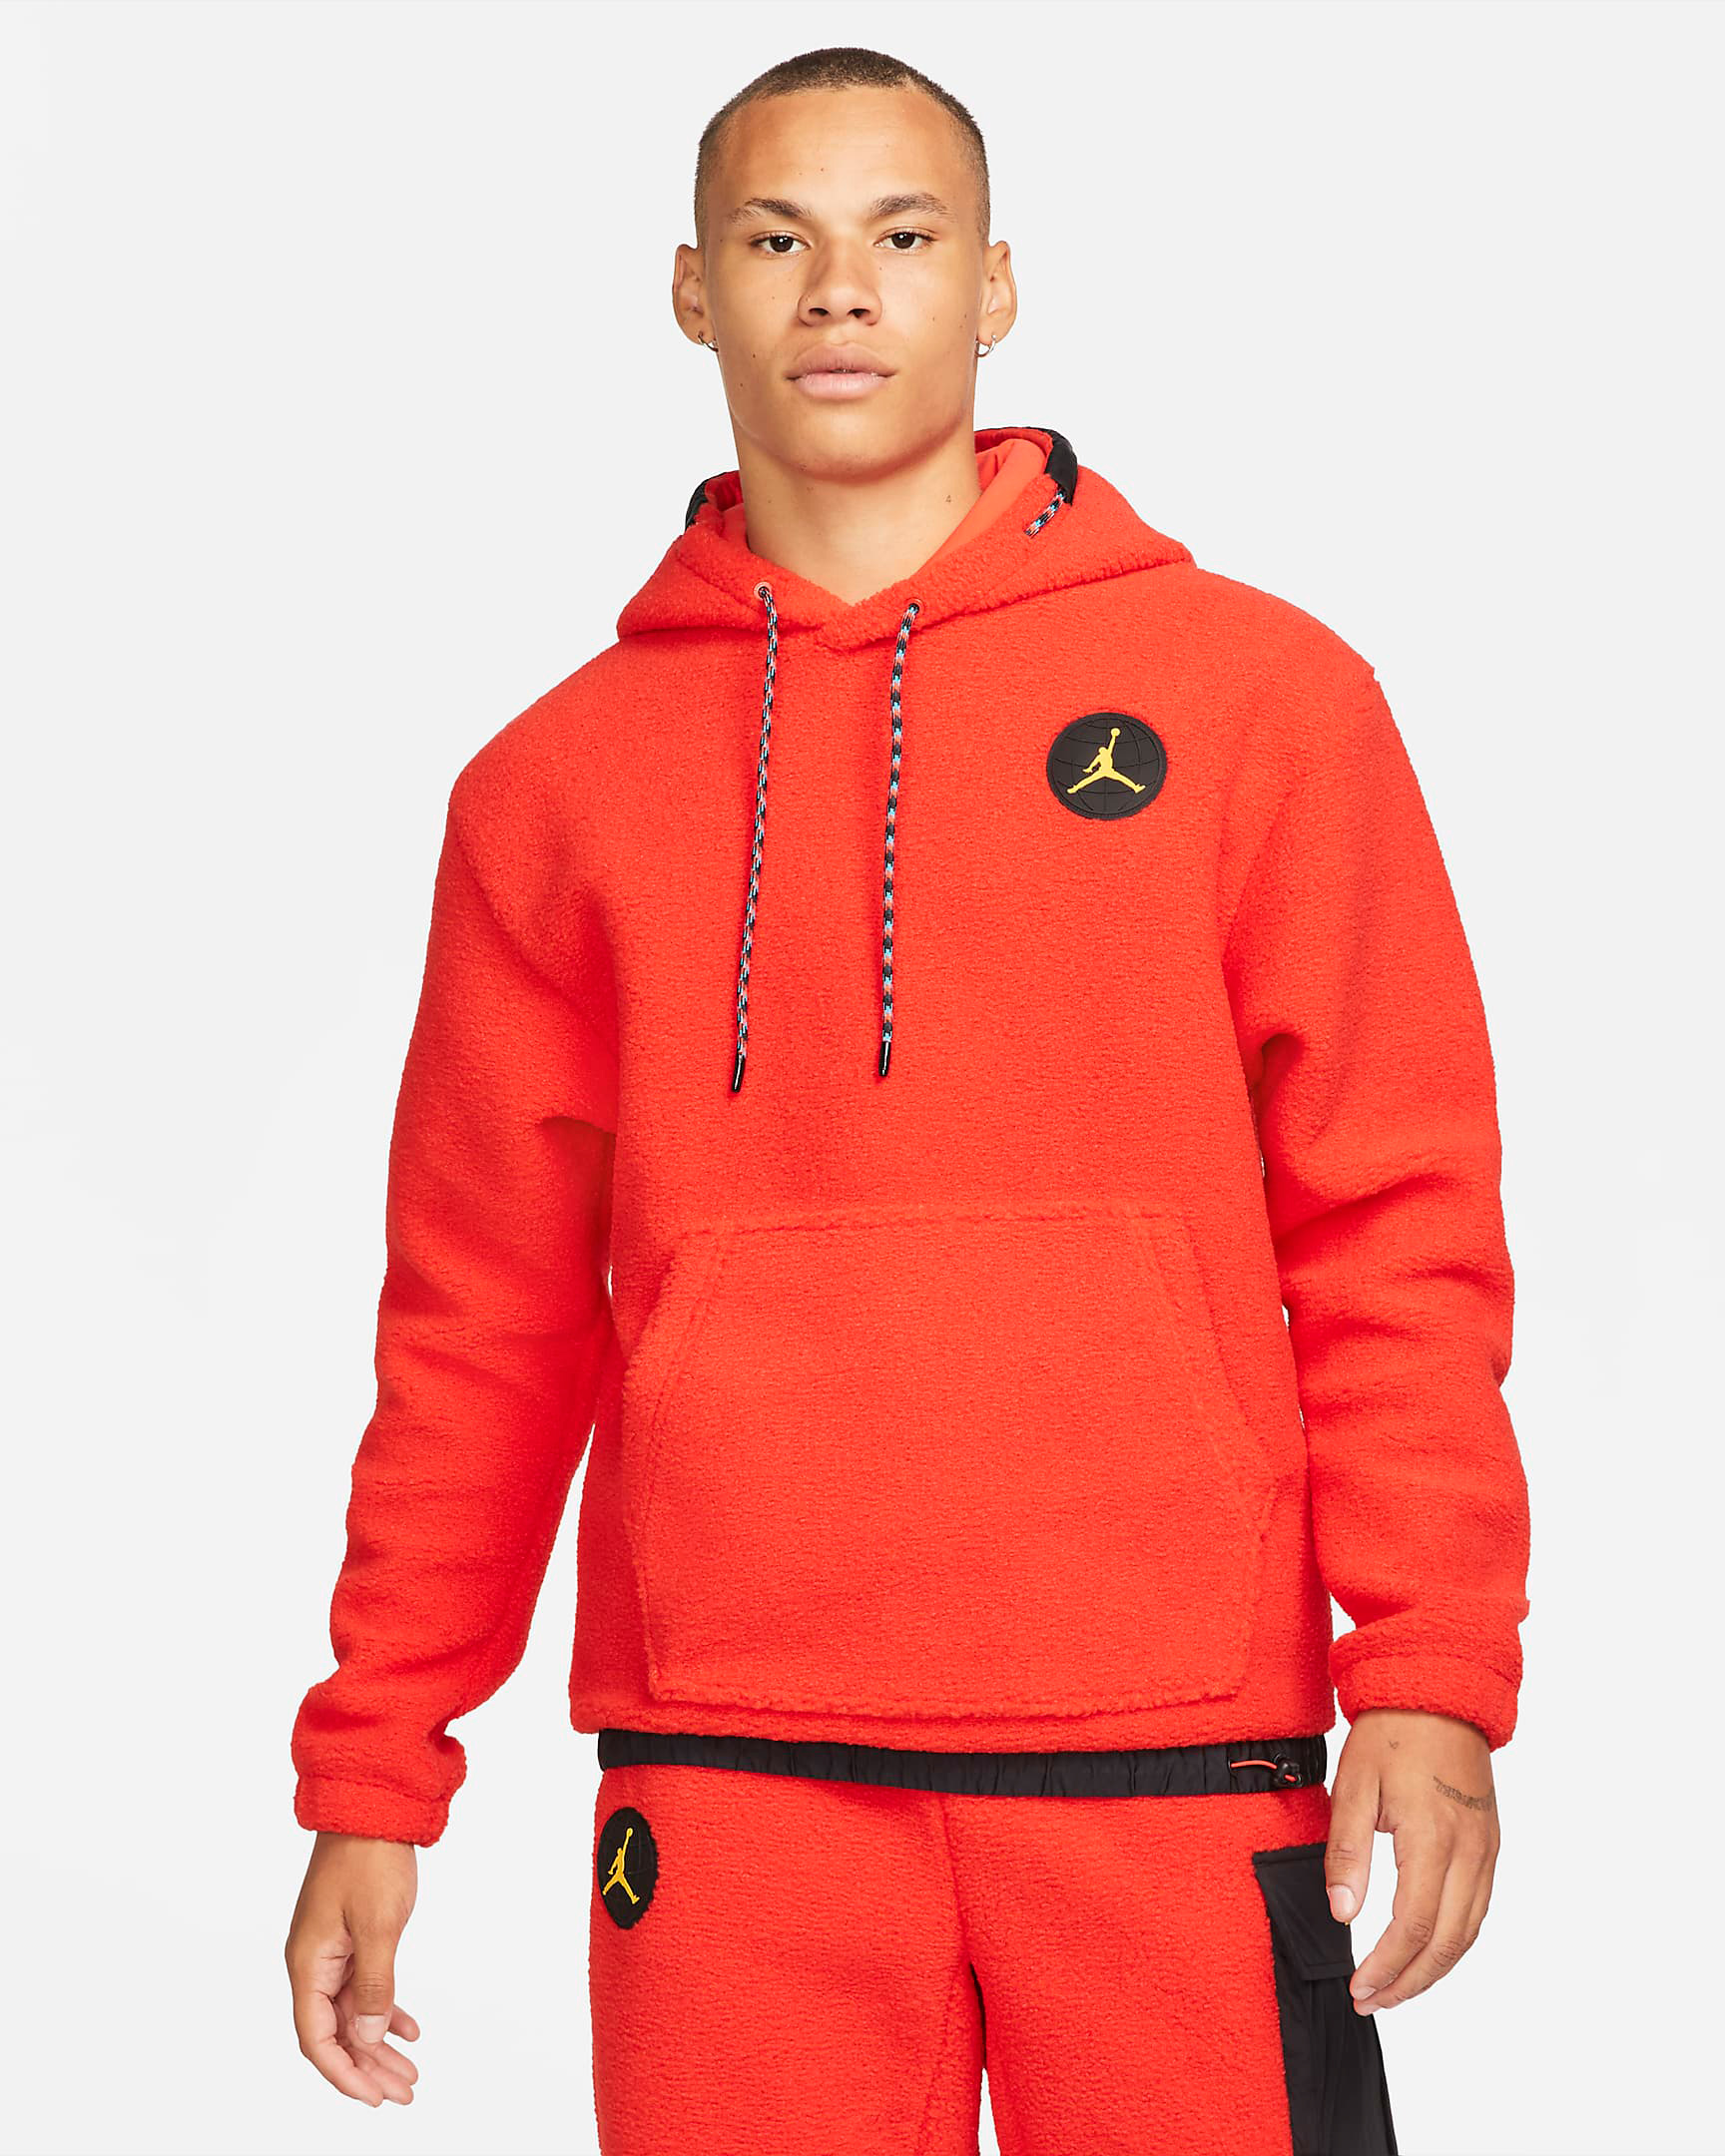 jordan-chile-red-mountainside-hoodie-1